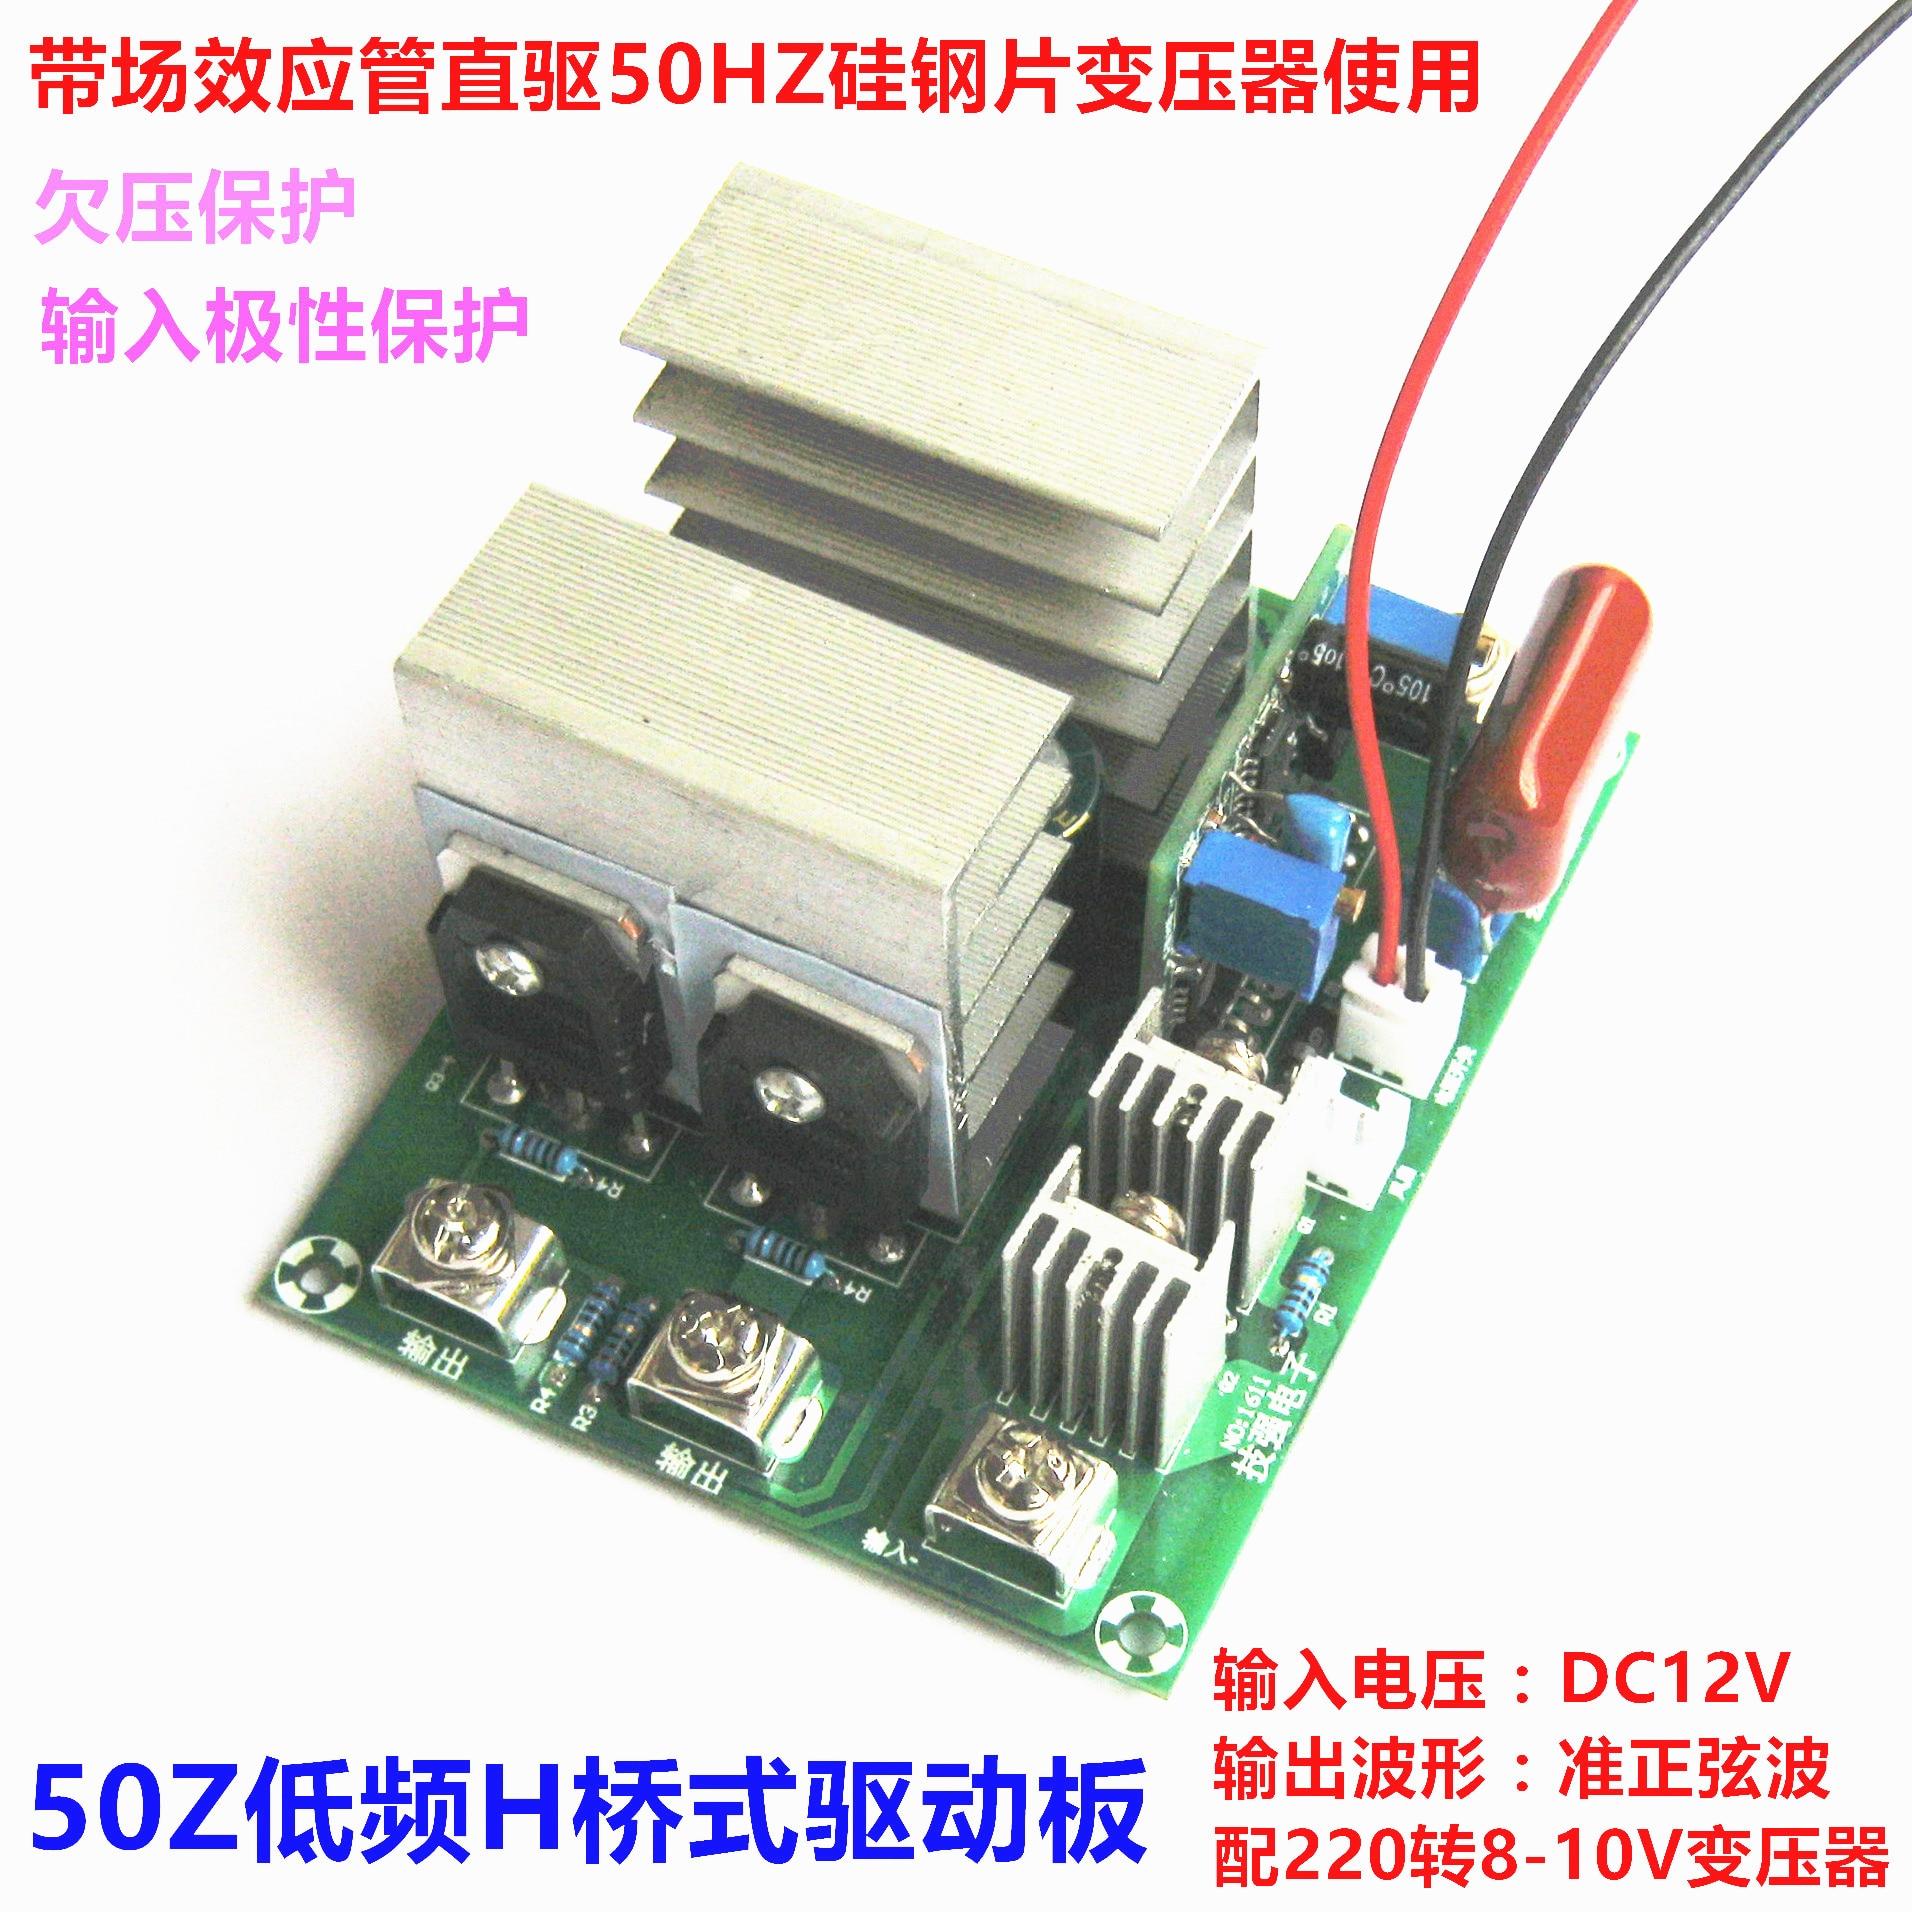 Single 12V Boost 220V Variable Voltage Device, Bridge Type 50HZ Inverter Drive Board, 500W with Voltage Regulation, Quasi Sine W